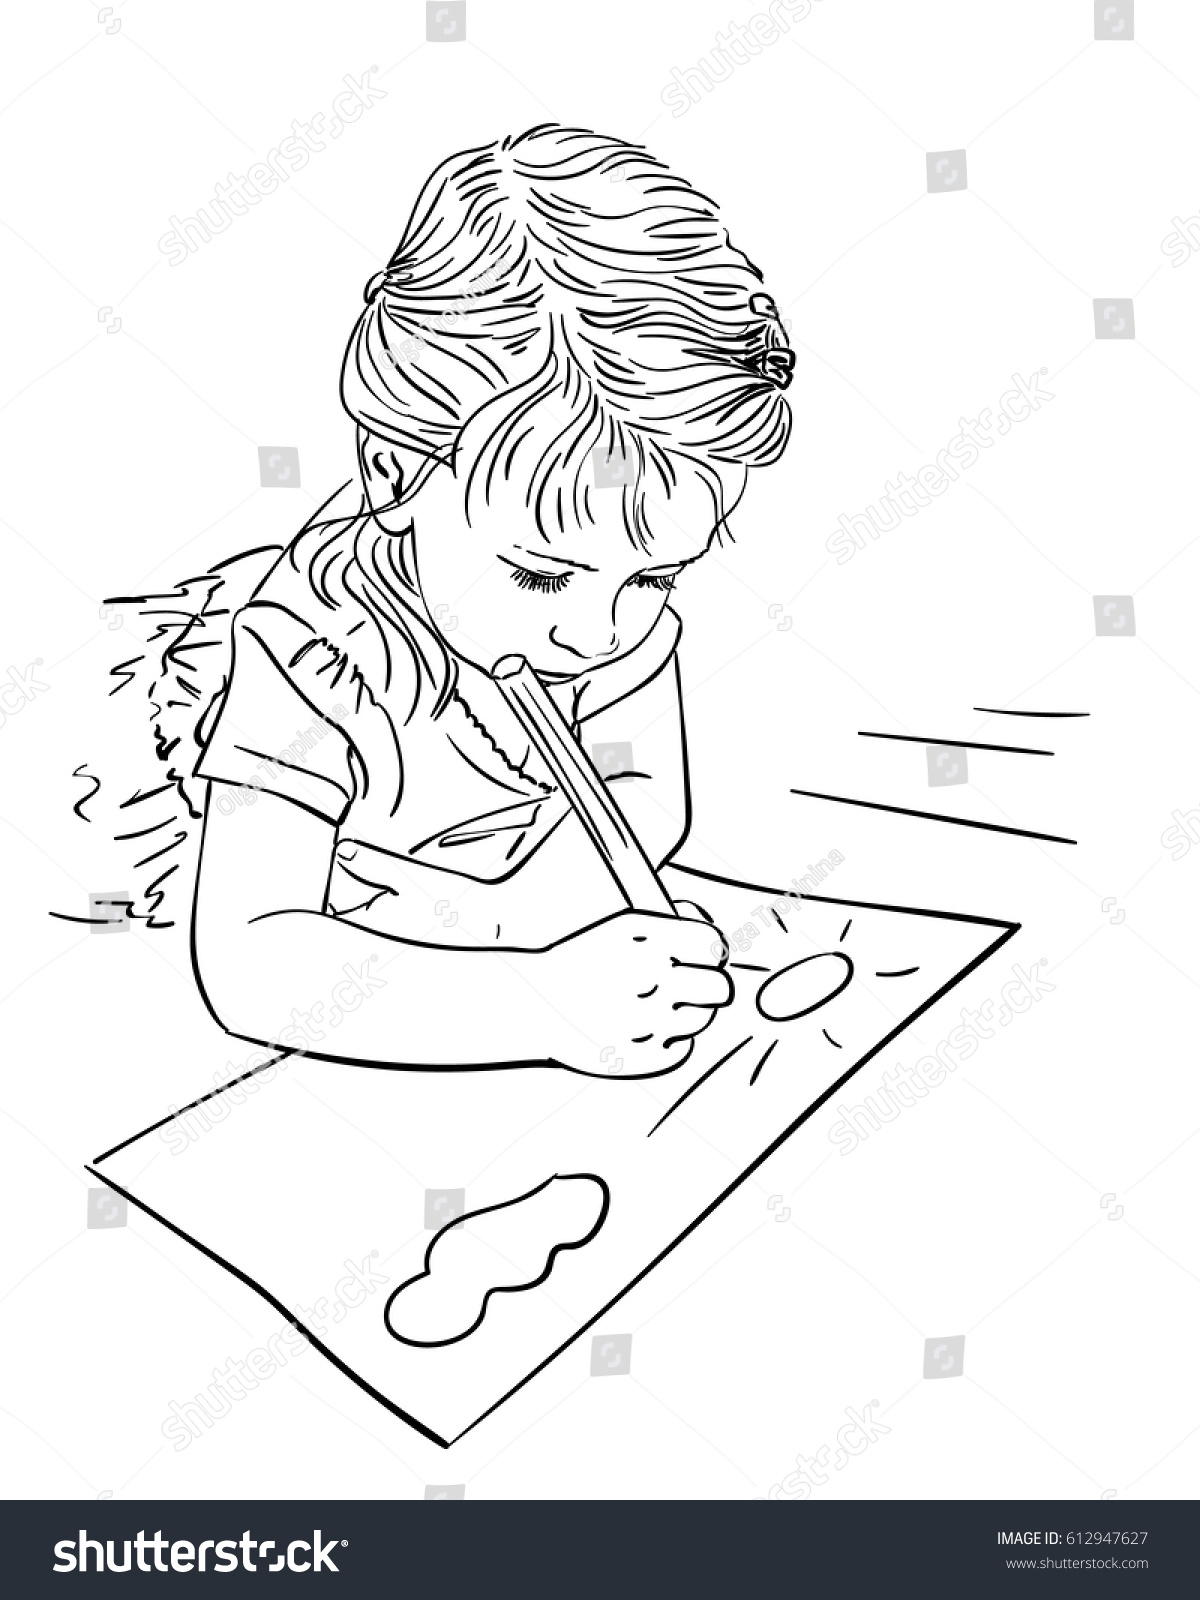 Line Art Floors : Child drawing cloud sun on paper stock vector